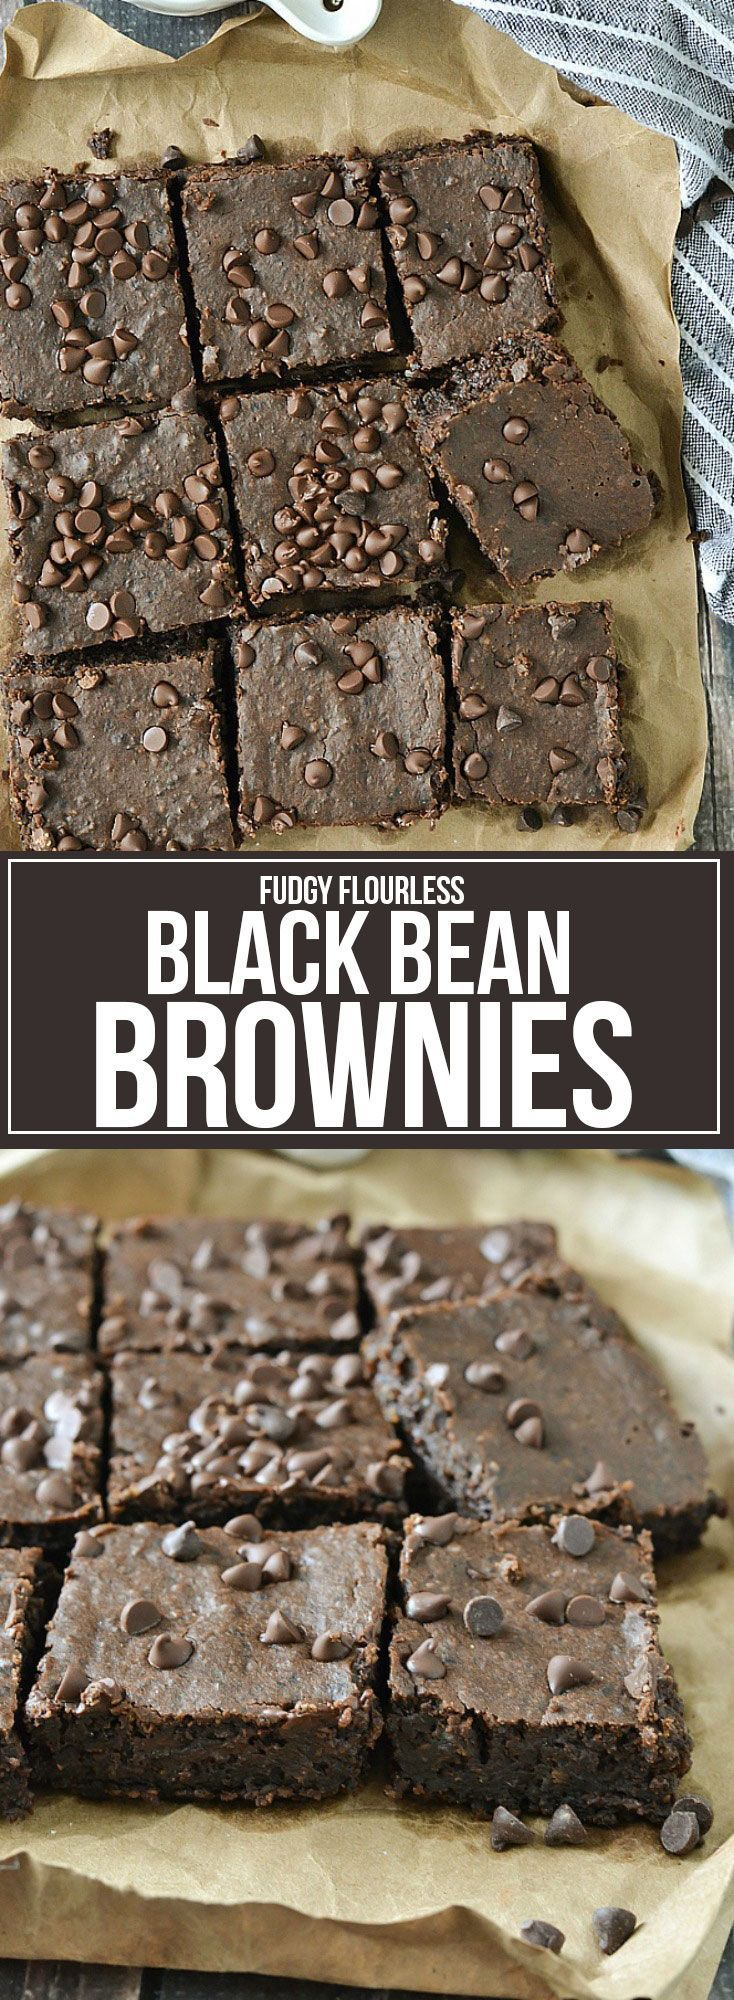 Fudgy Flourless Black Bean Brownies  The post Fudgy Flourless Black Bean Brownie…